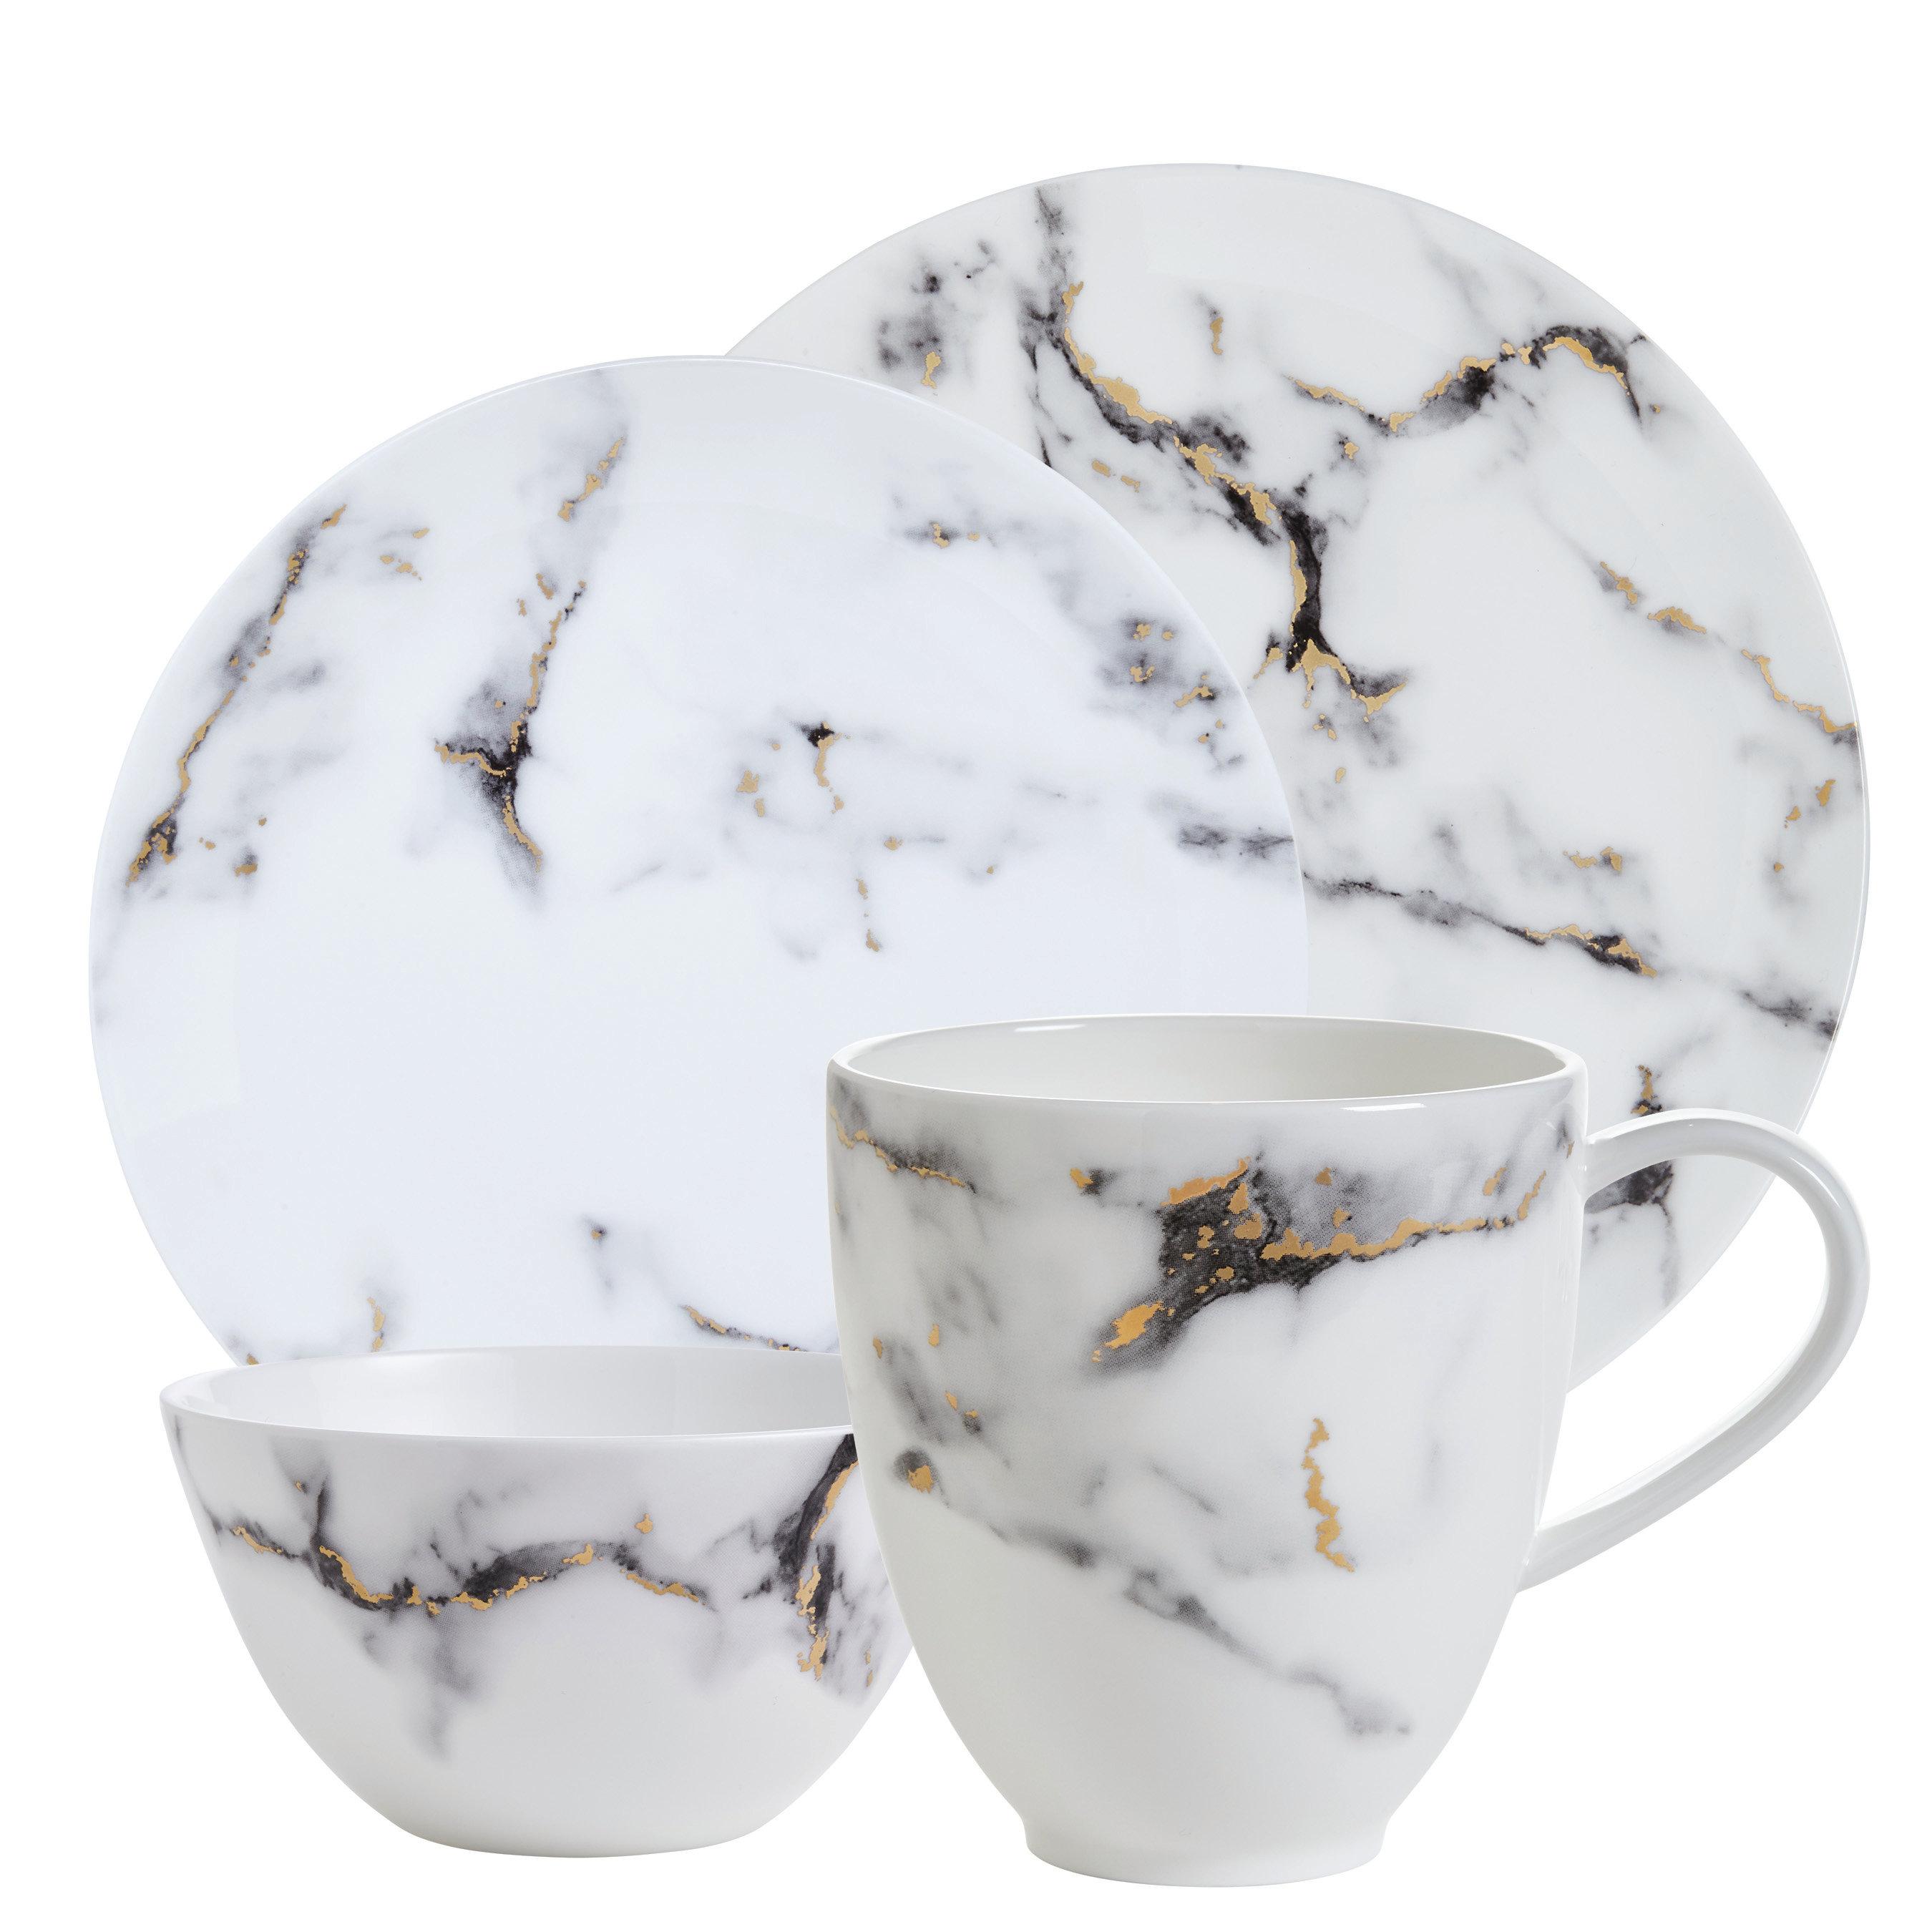 Prouna Marble Venice Fog Bone China 4 Piece Place Setting Perigold